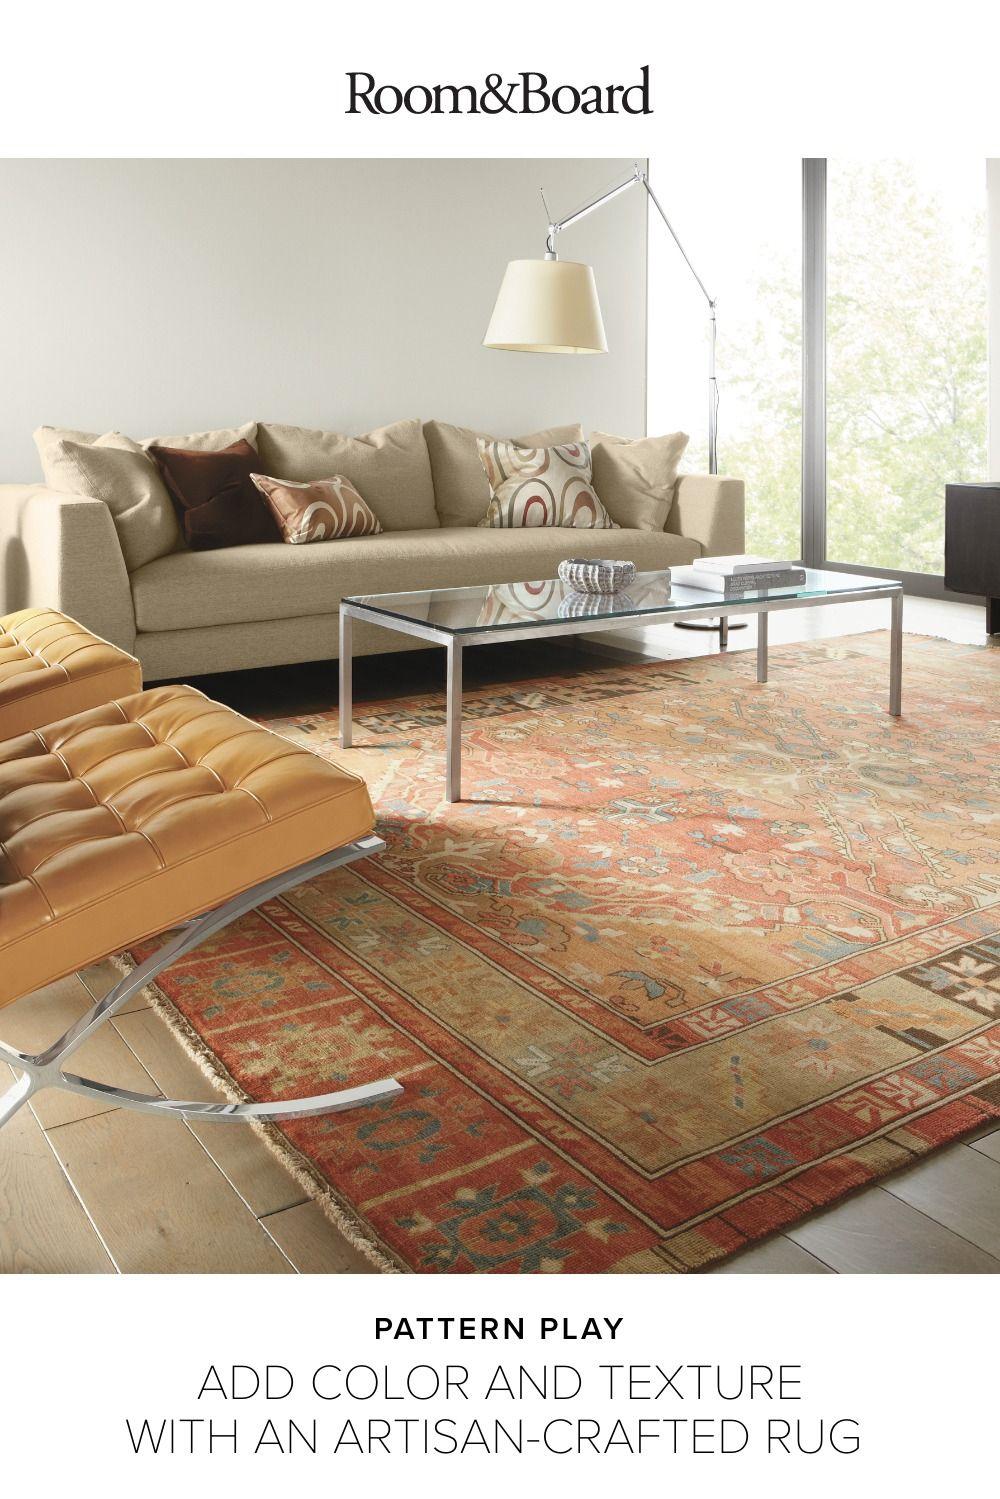 Kayseri Rugs Modern Patterned Rugs Modern Rugs Room Board In 2021 Living Room Accent Tables Living Room Inspo Modern Rugs